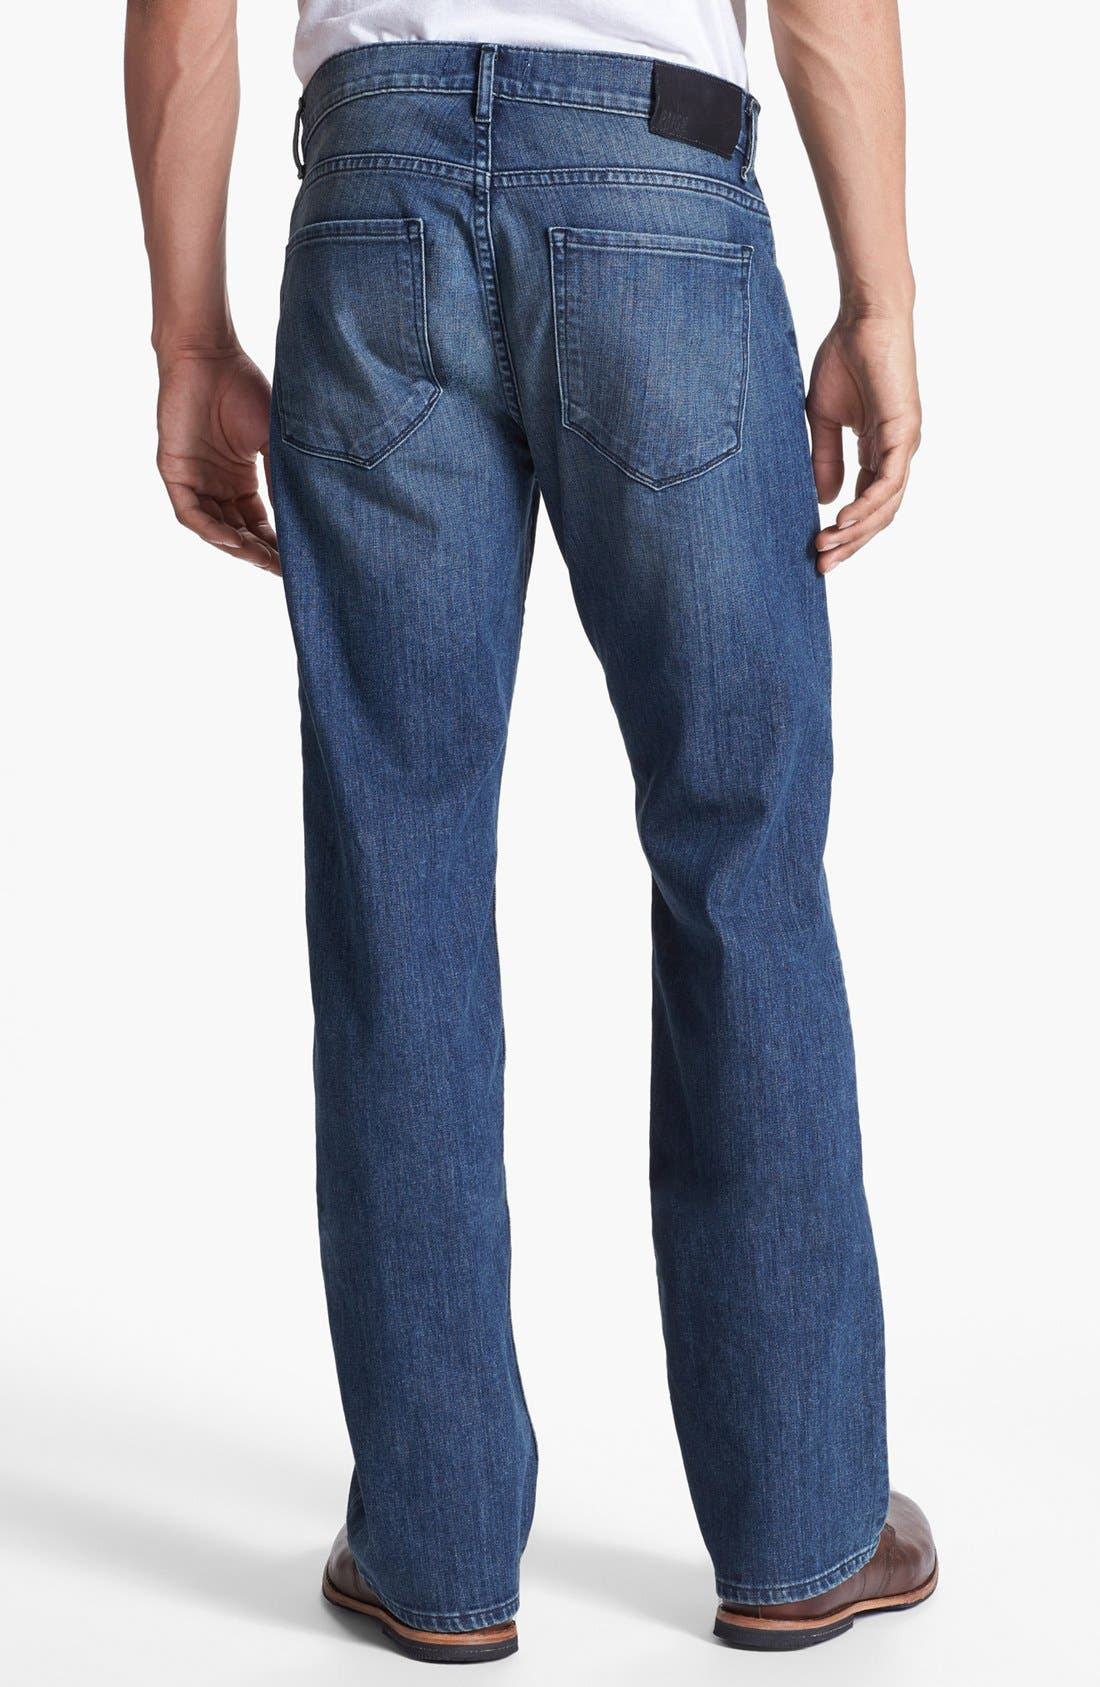 Main Image - Paige 'Doheny' Straight Leg Jeans (Winston)